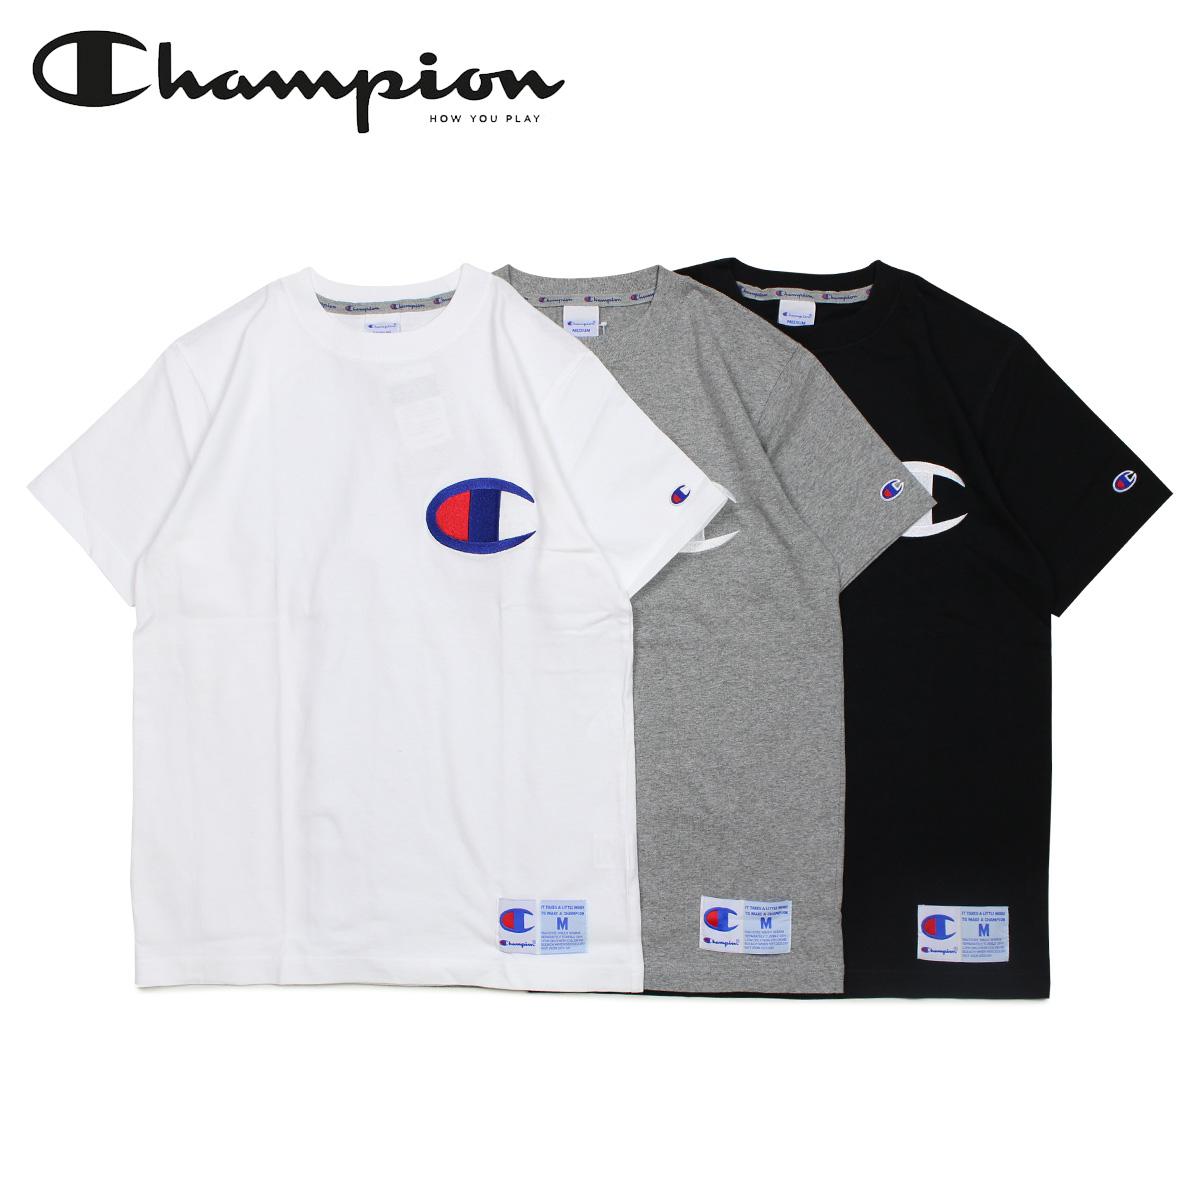 26abc07633f3 Champion Champion T-shirt short sleeves men gap Dis big logo BIG LOGO T-SHIRT  black white gray black and white C3-F362 [4/25 Shinnyu load]